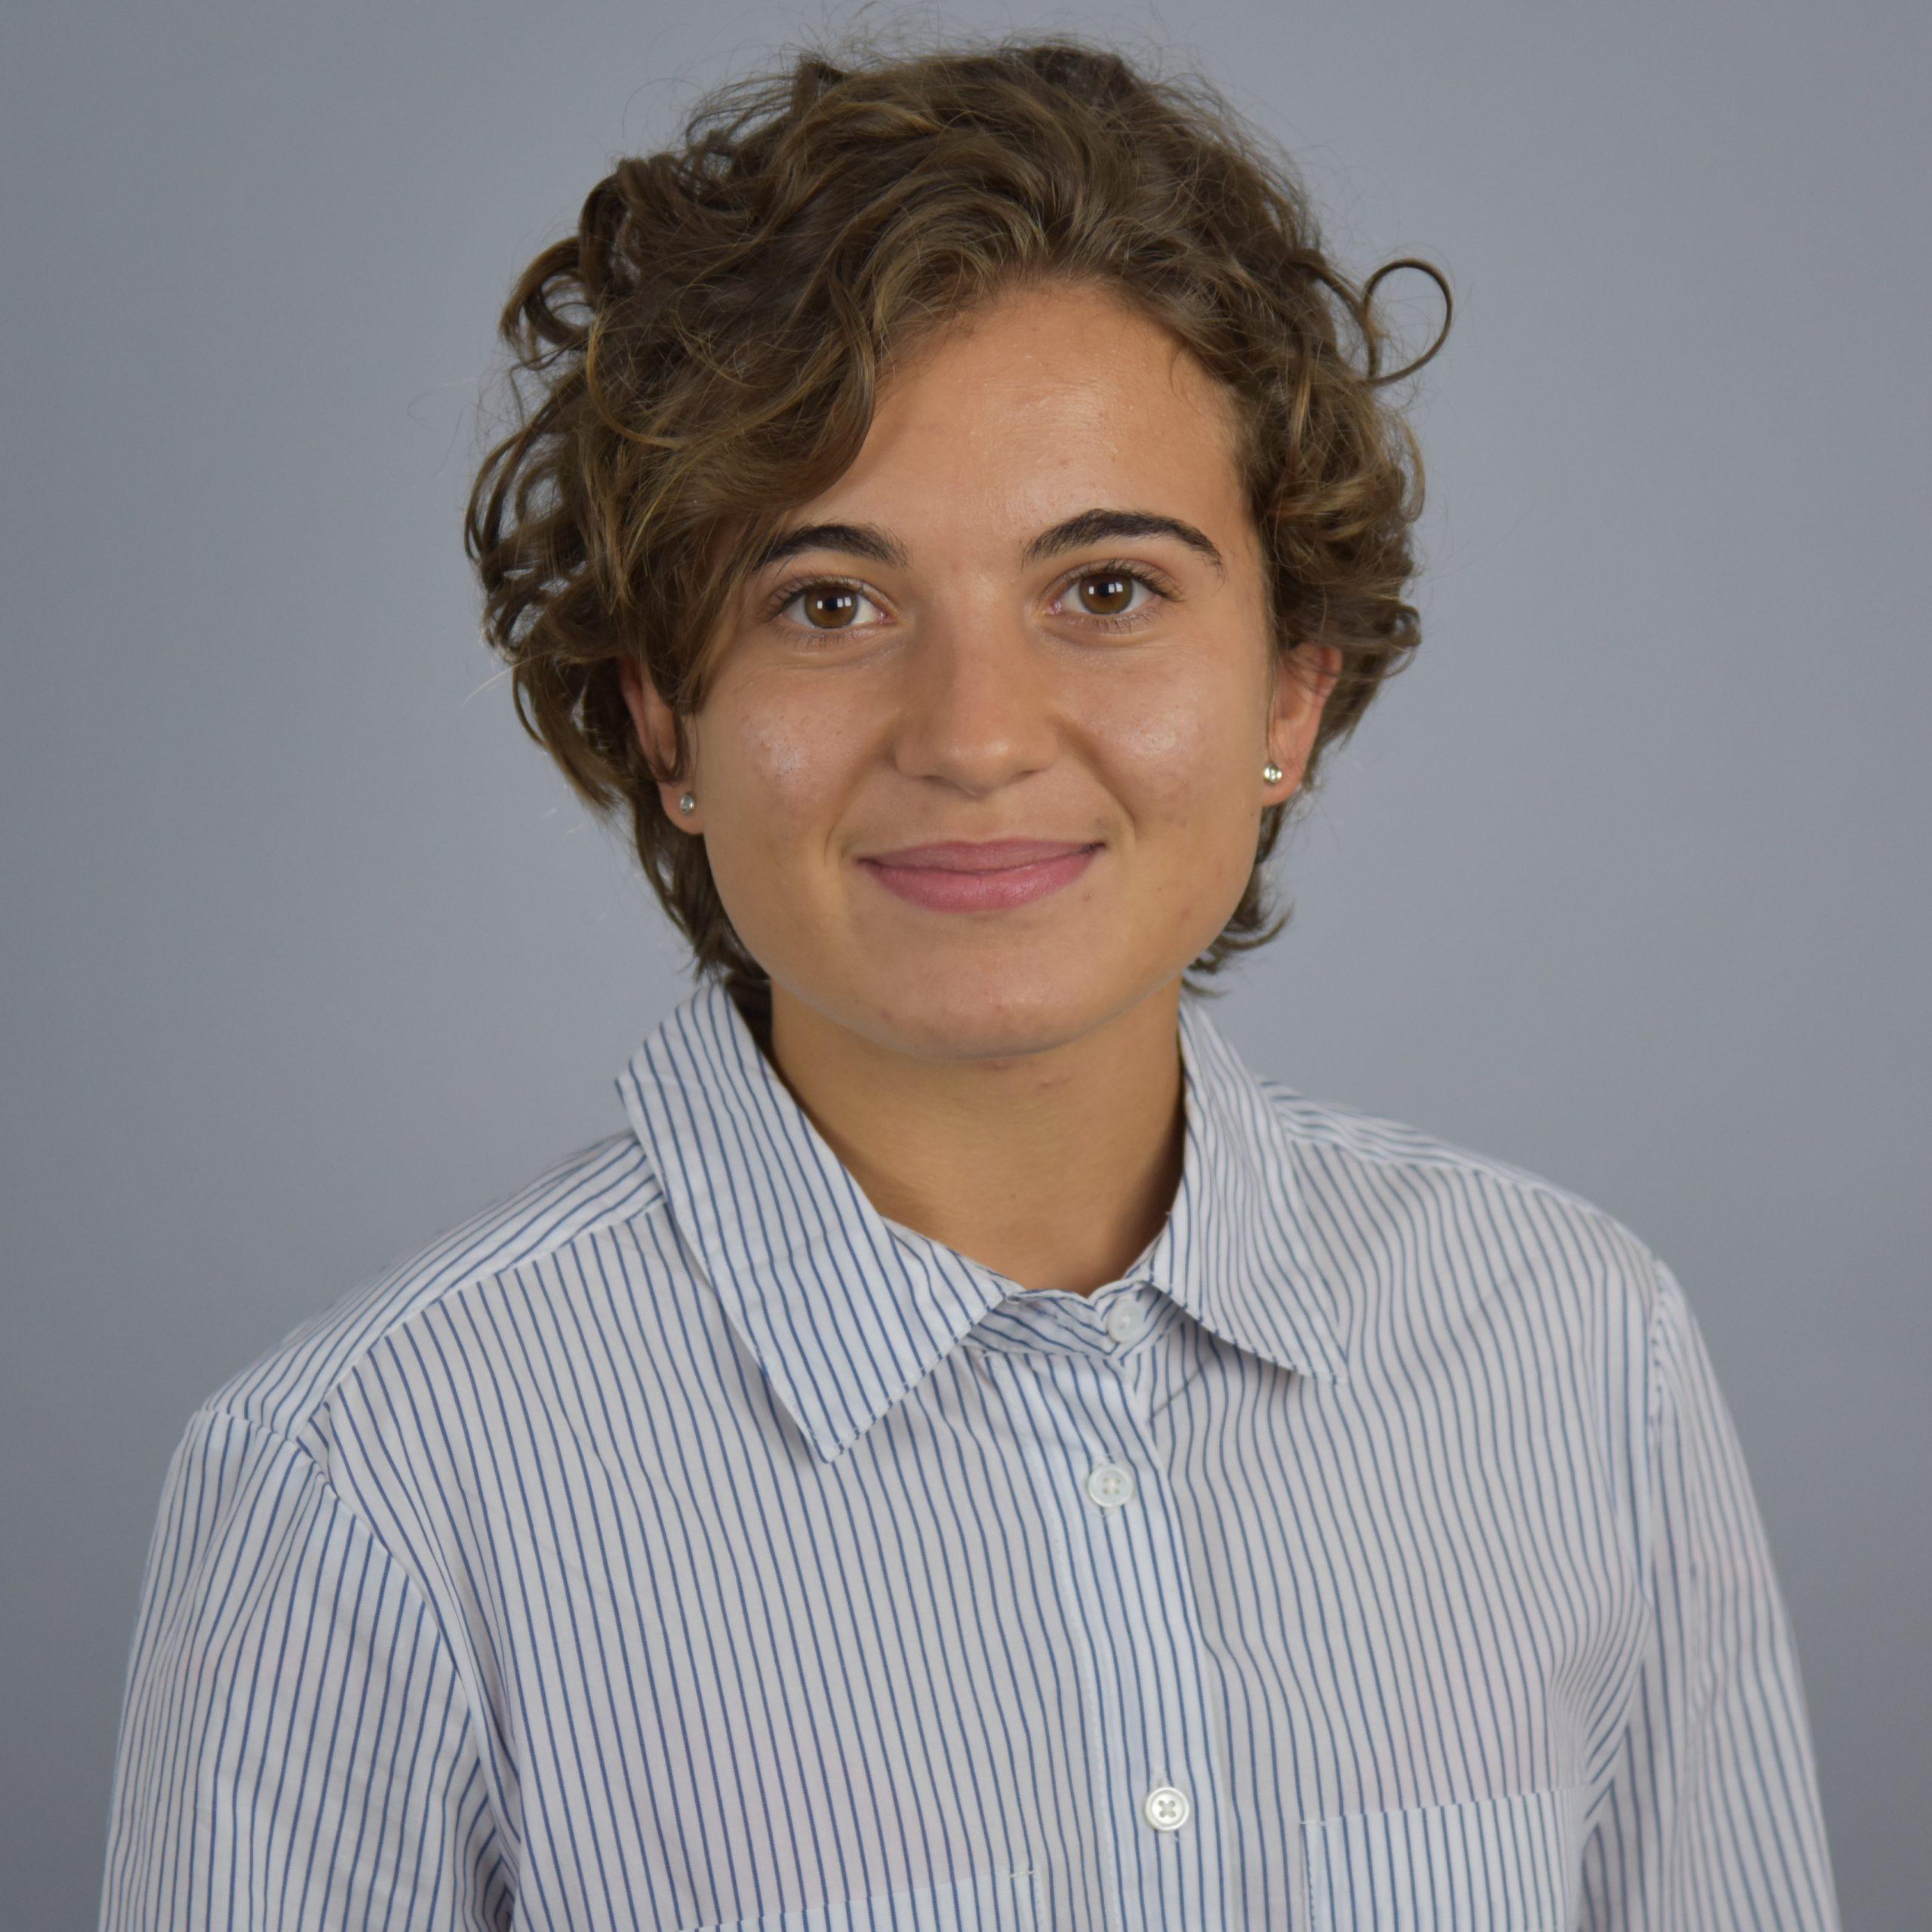 Sarah Kleinmann